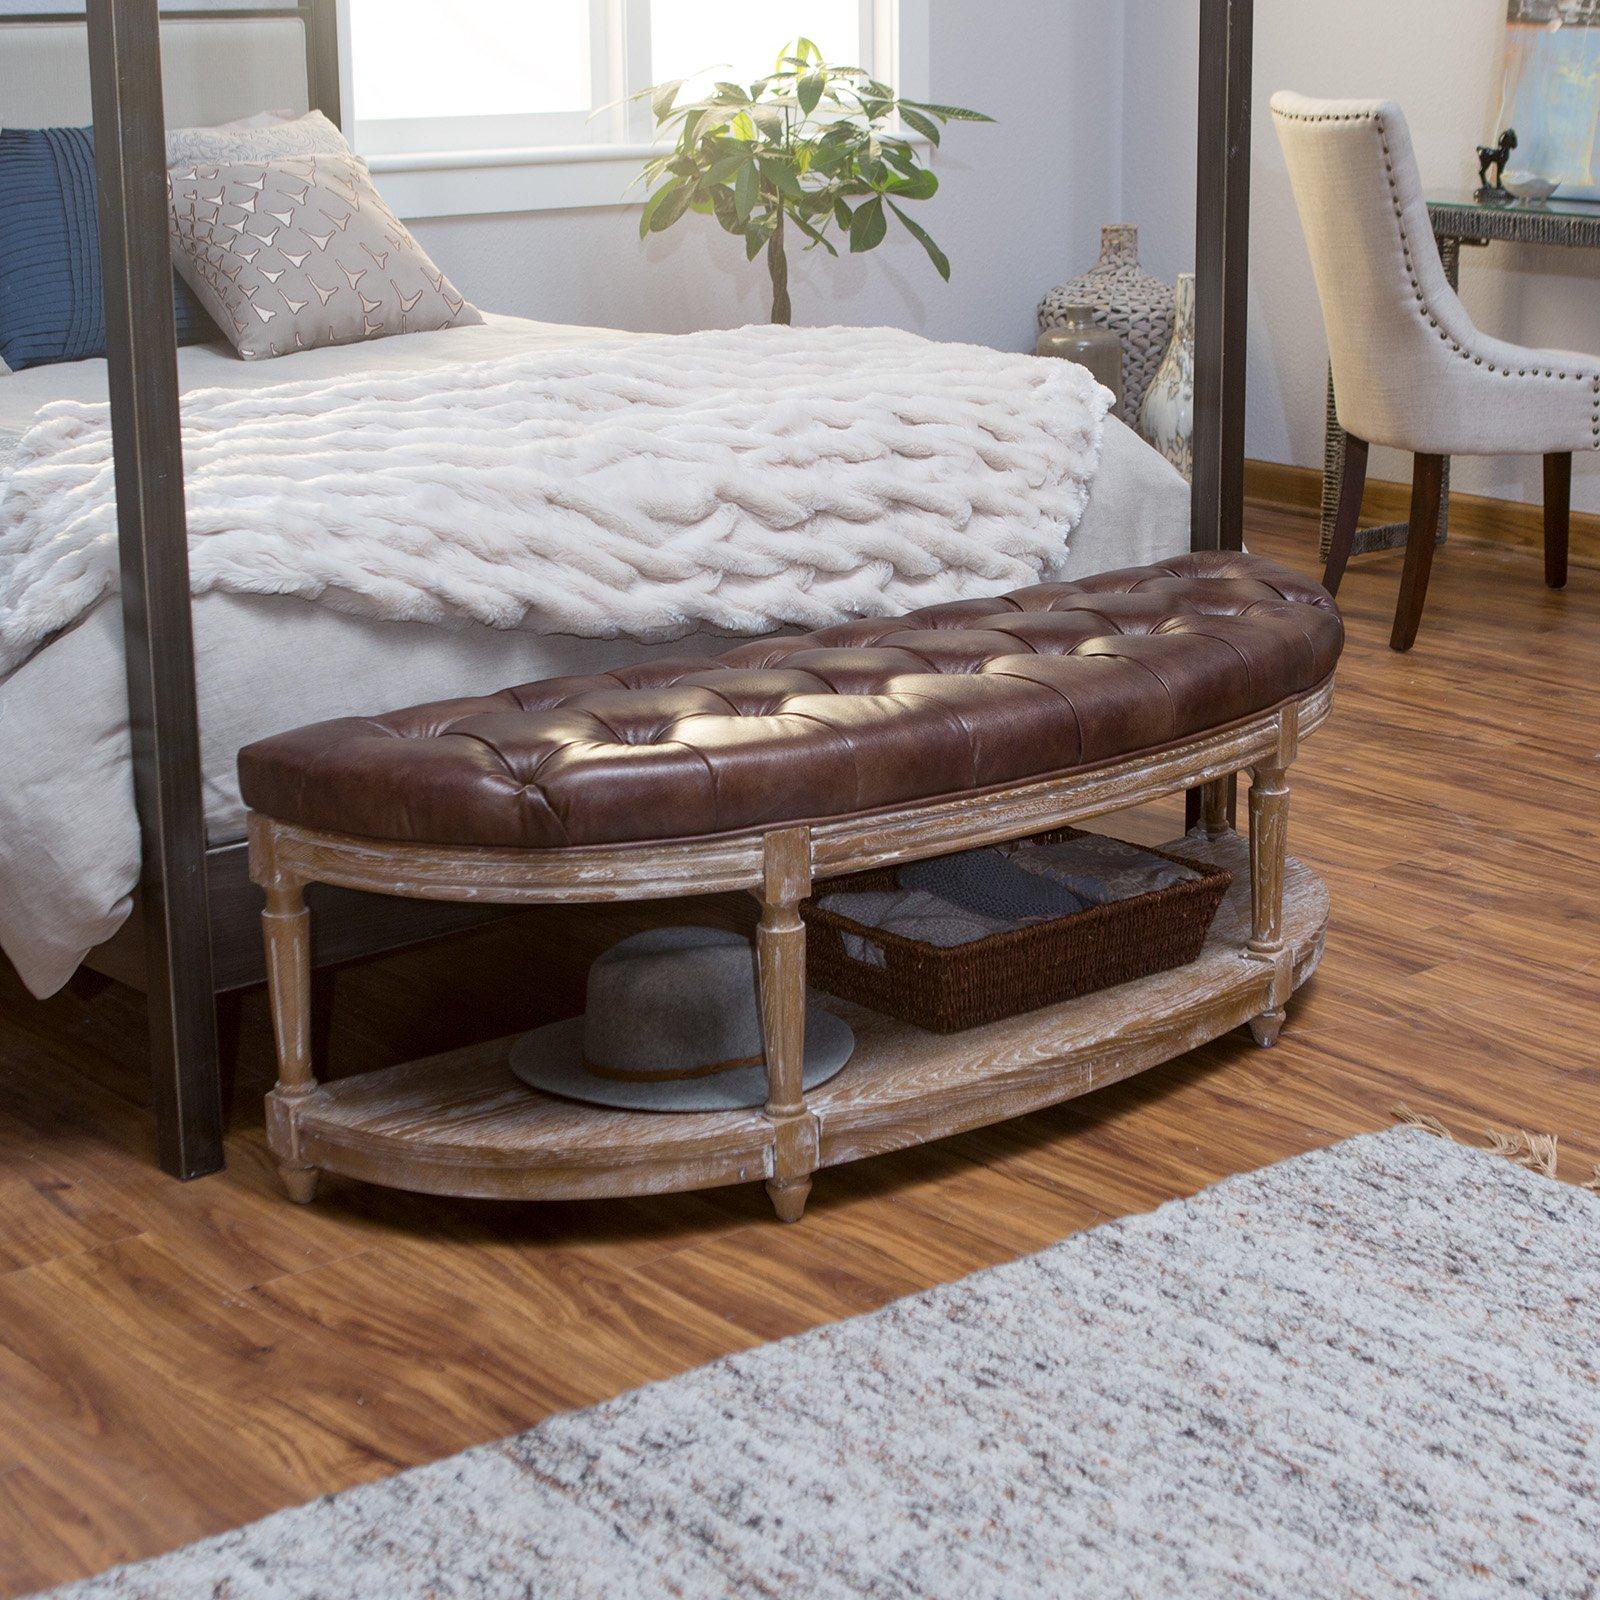 Outstanding Belham Living Tenley Tufted Half Moon Bench With Shelf In Machost Co Dining Chair Design Ideas Machostcouk